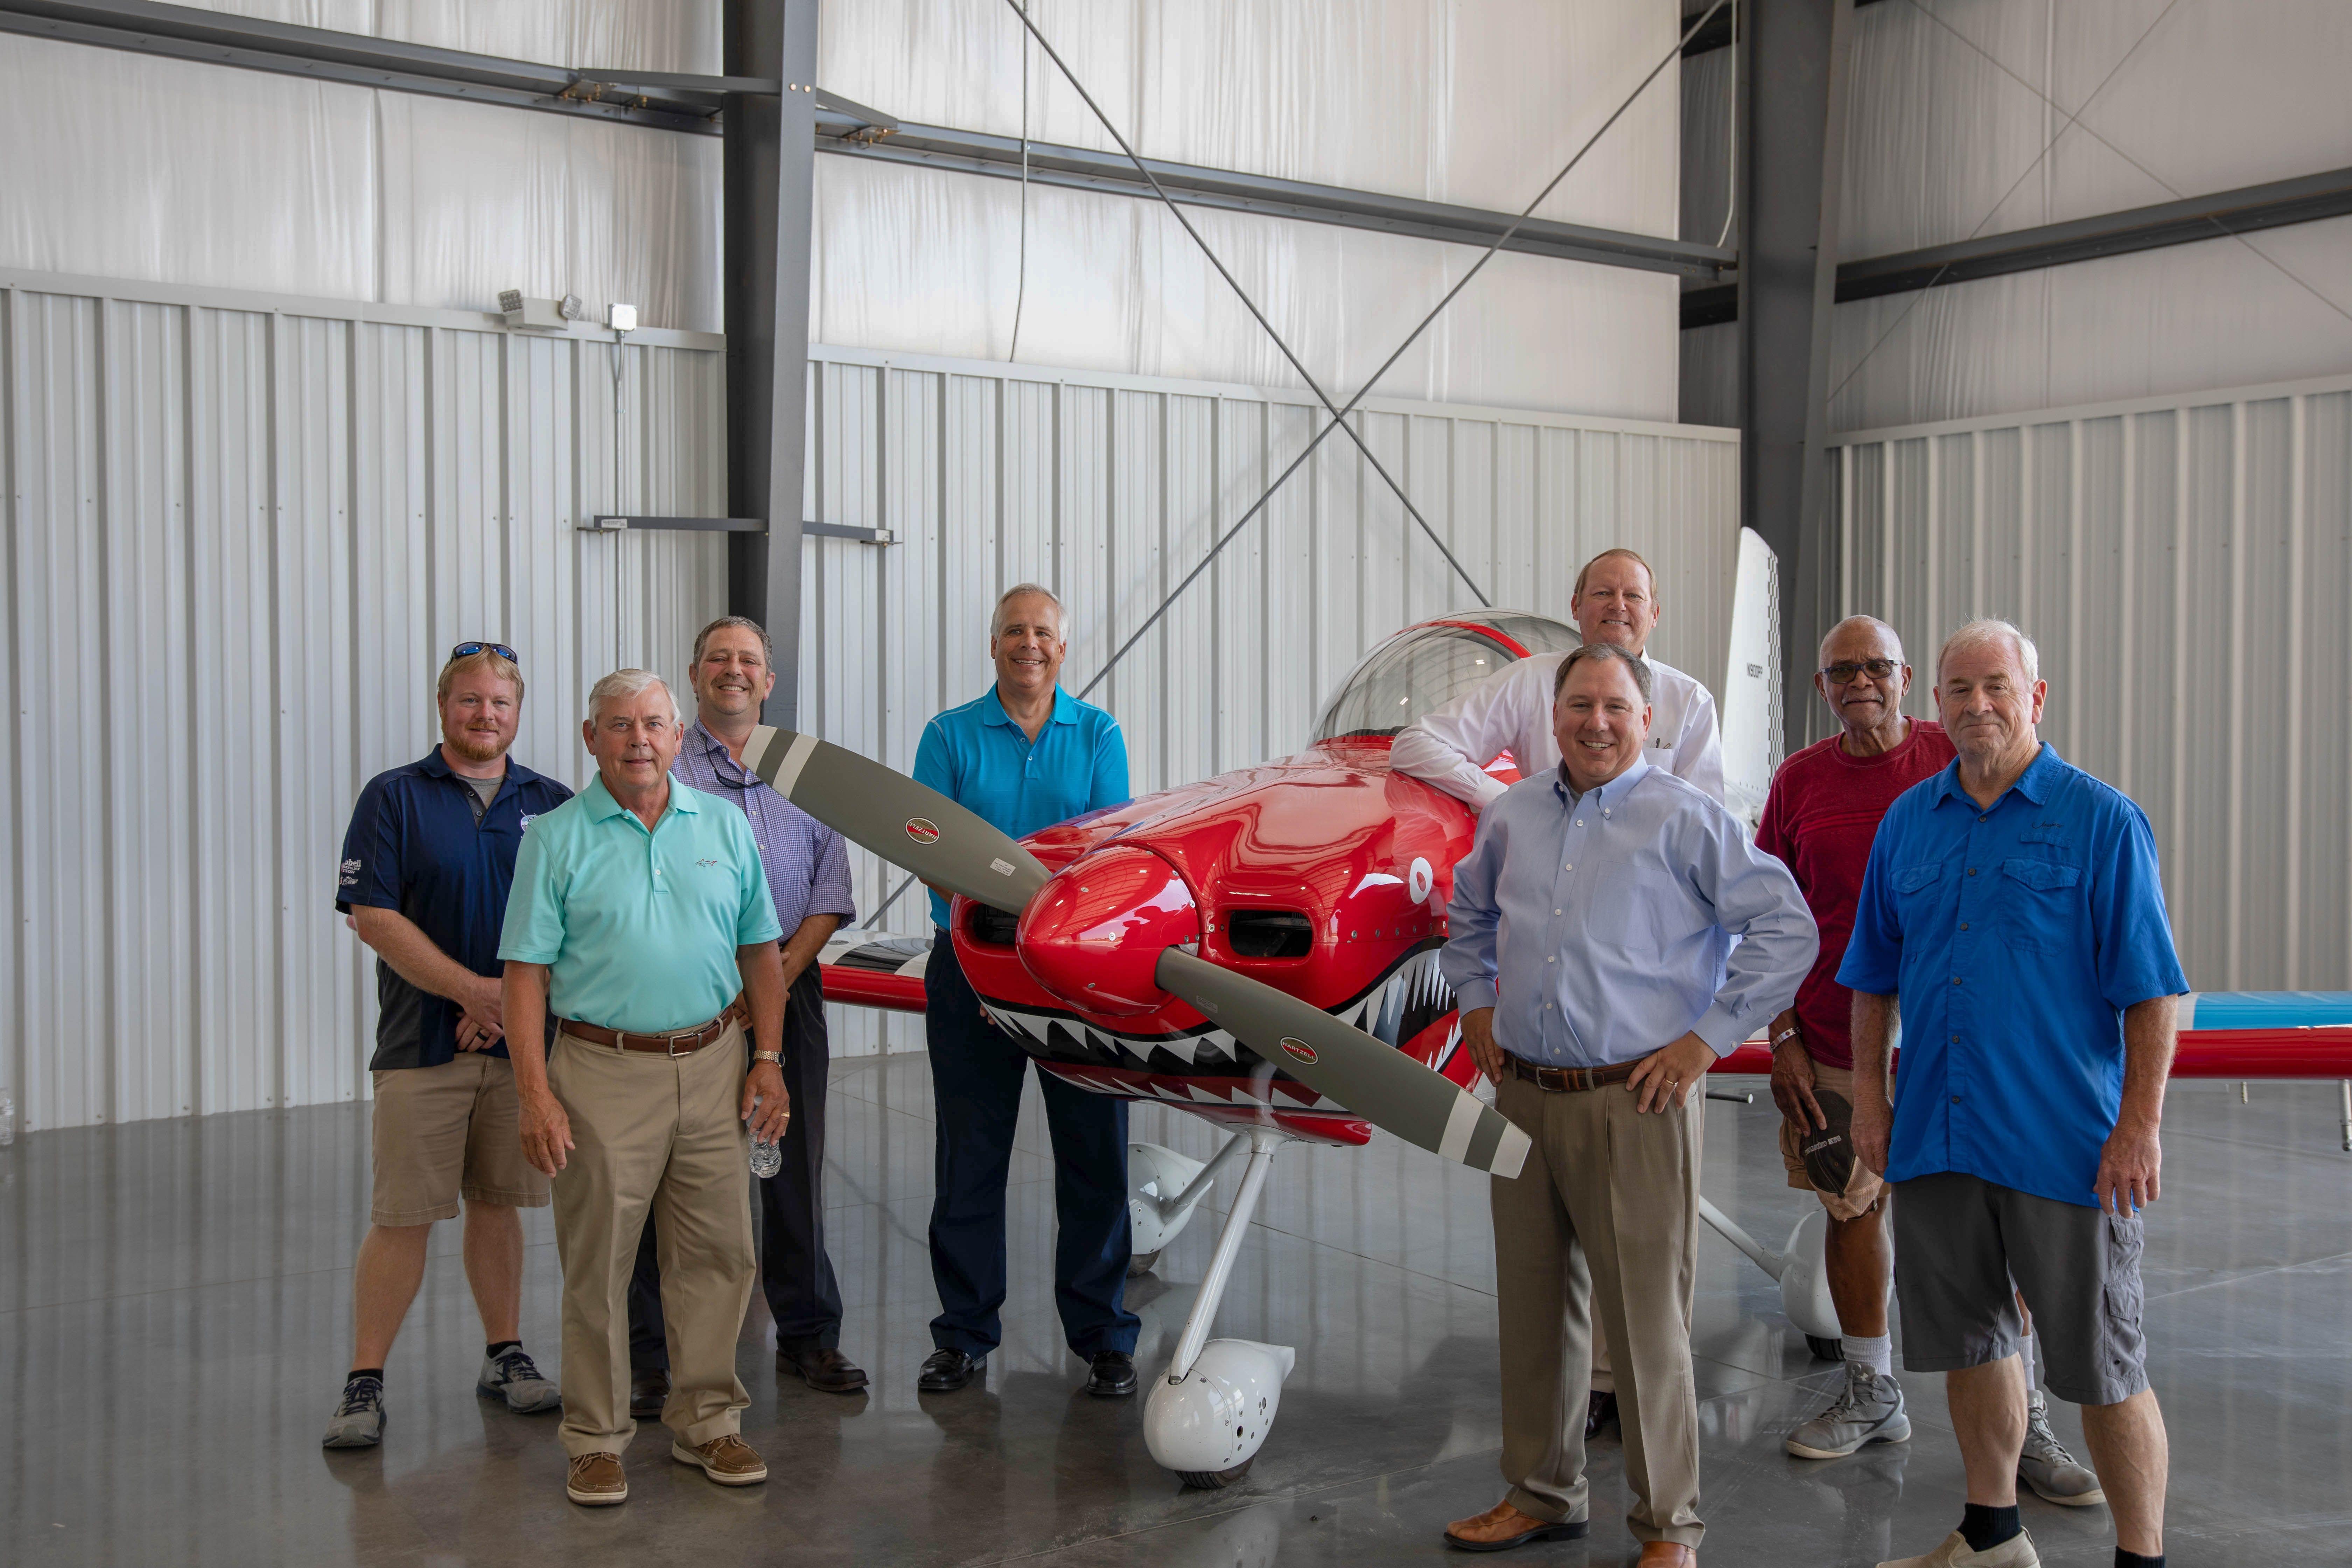 Wayne Executive Jetport Celebrates New Corporate Hangar